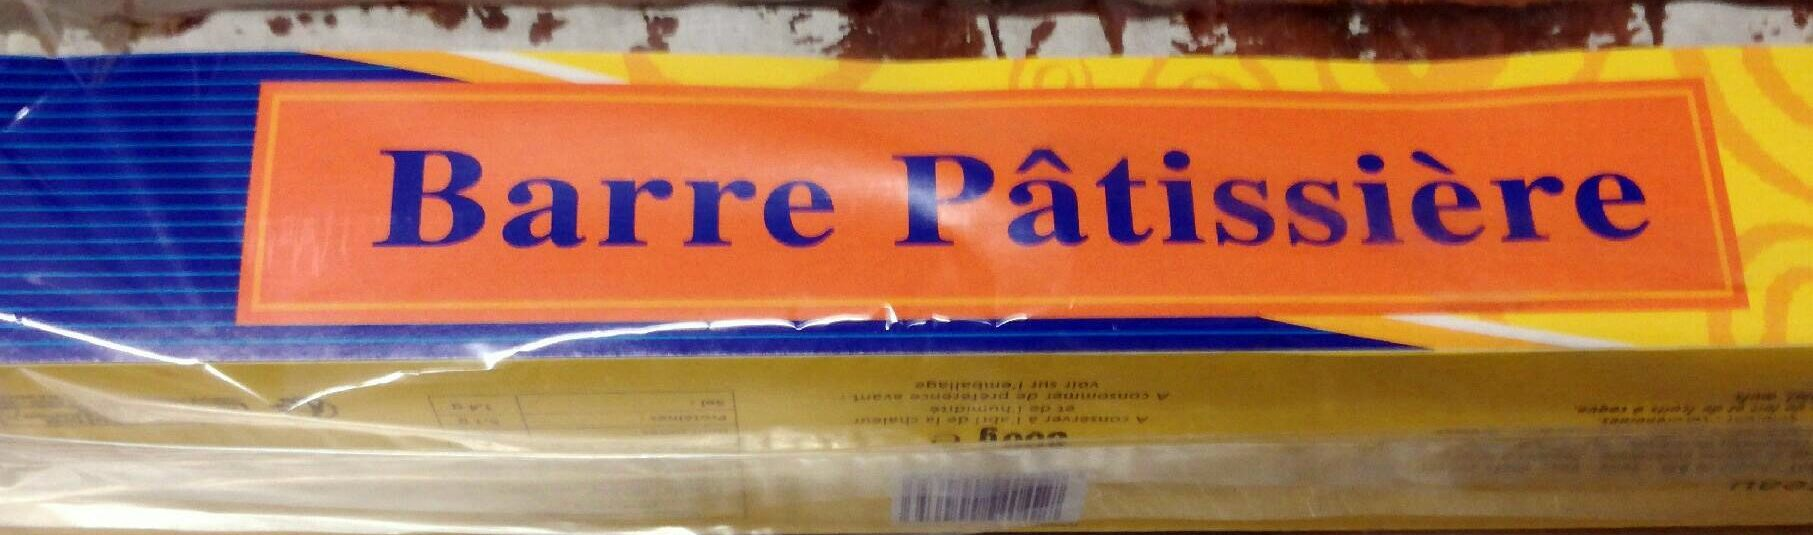 Barre Patissière - Product - fr